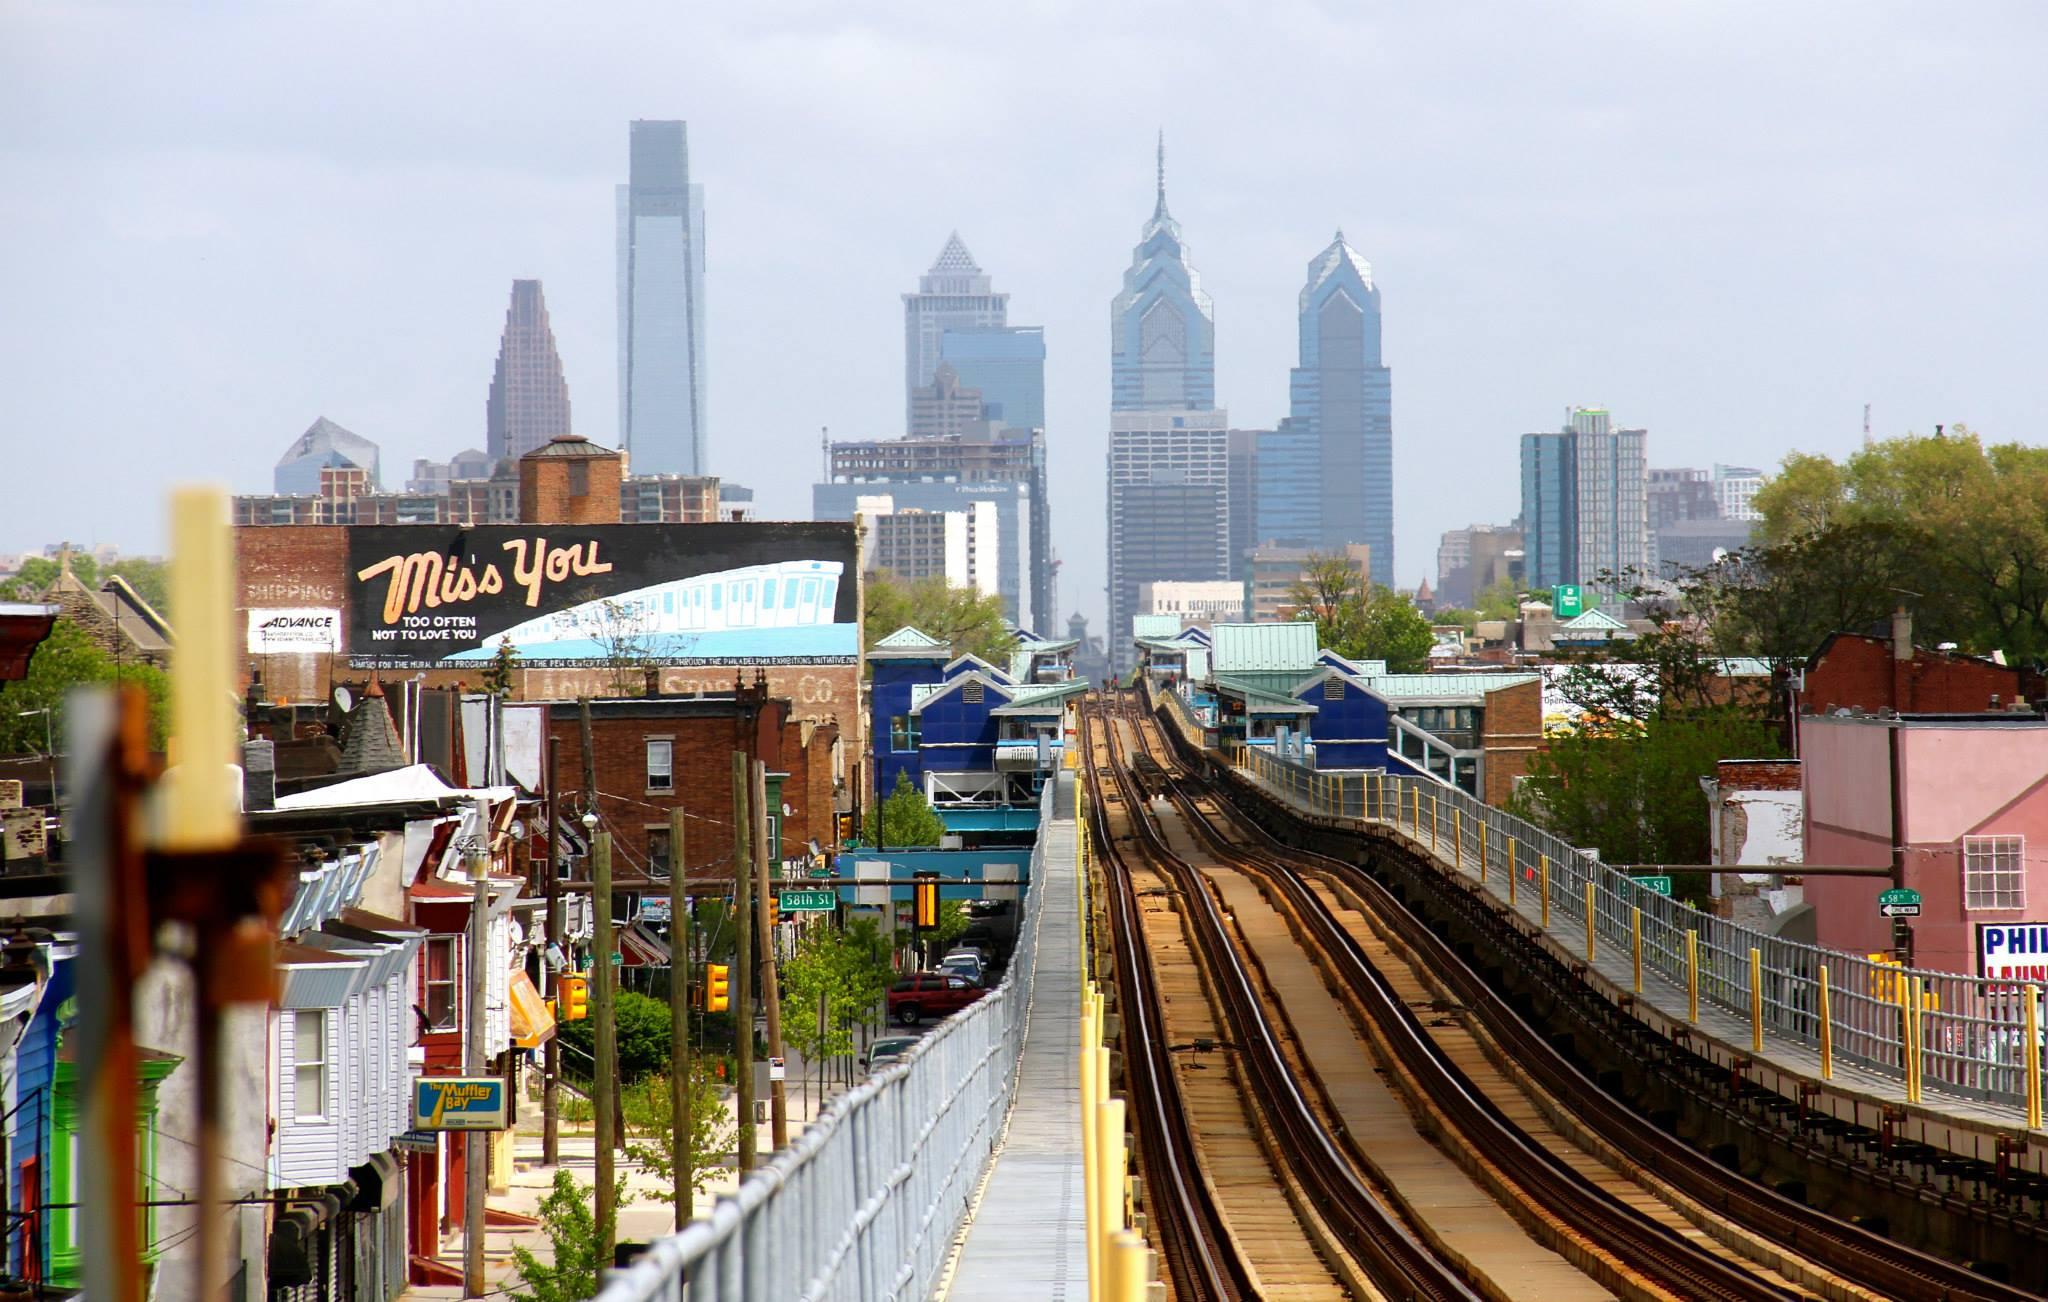 Market-Frankford Line, Philadelphia, USA